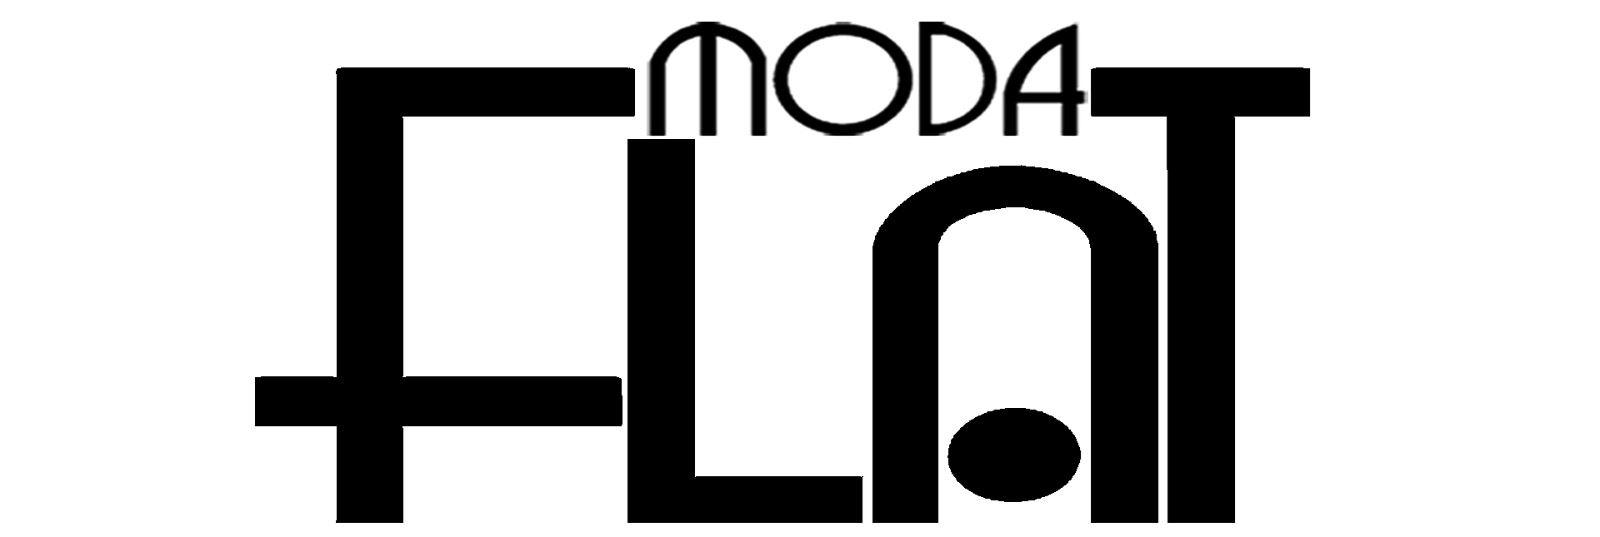 Flat Moda